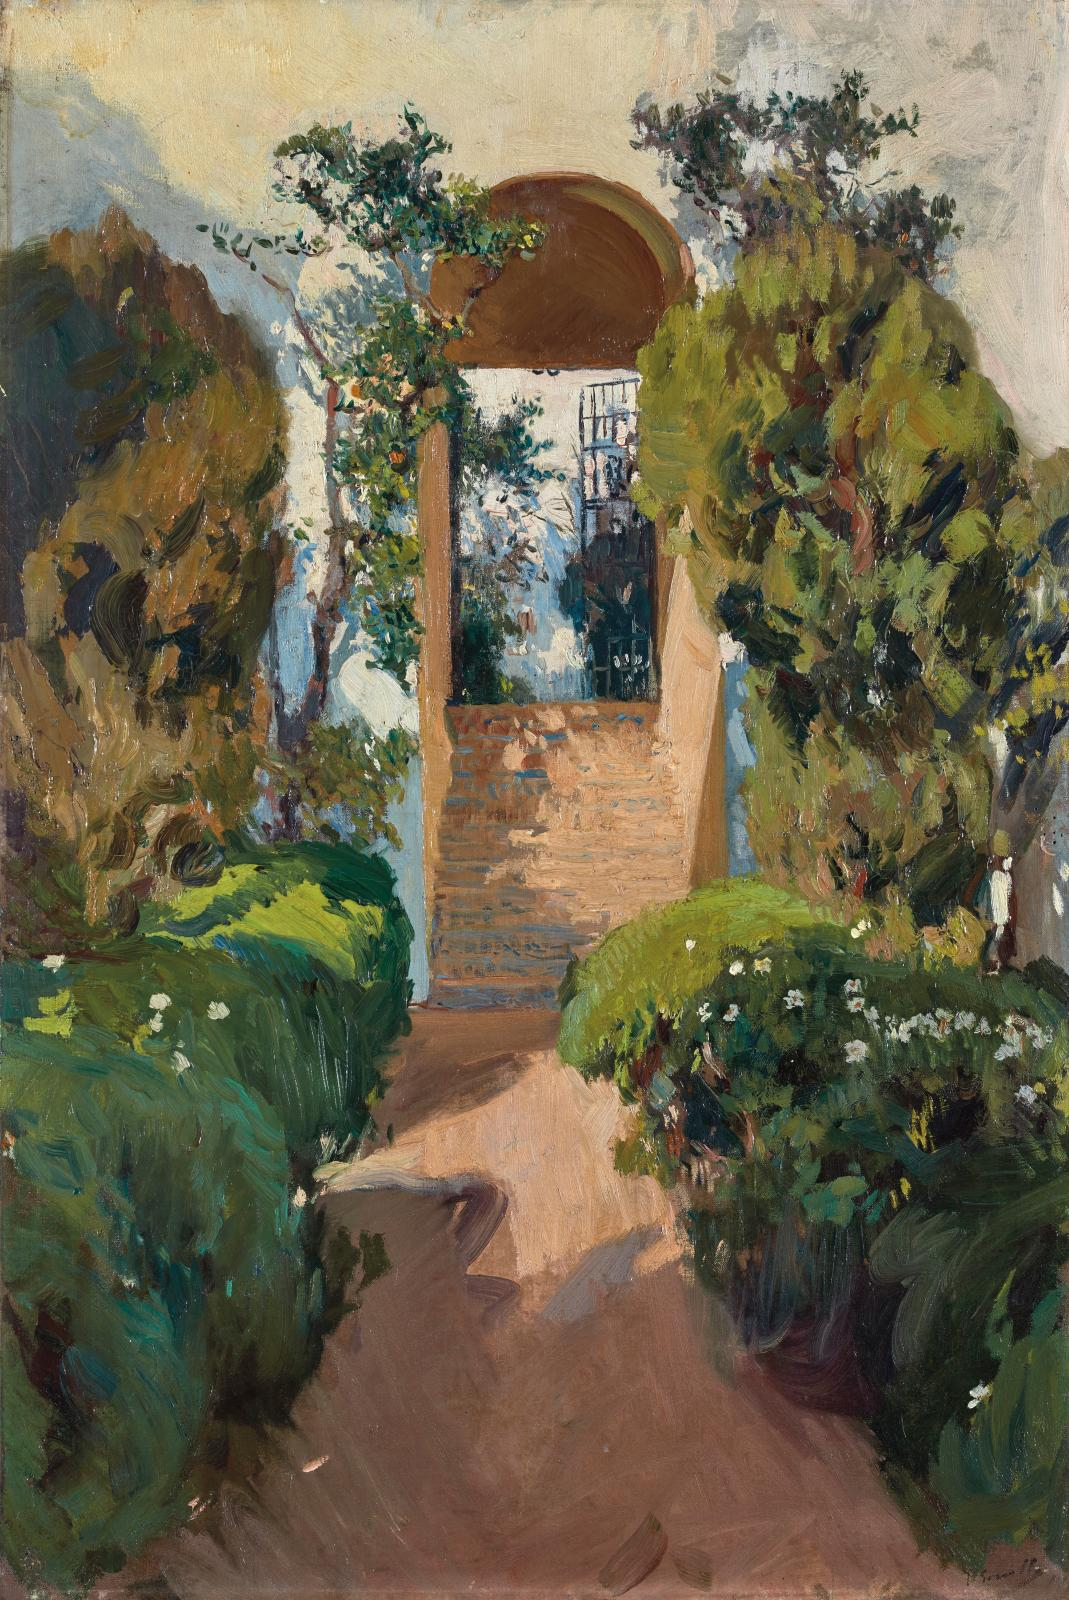 Joaquin Sorolla y Bastida (1863-1923), Escalier vers le jardin supérieur (Stairway to the upper garden), Seville Alcazar, 1910, oil on canvas, 94.5 x